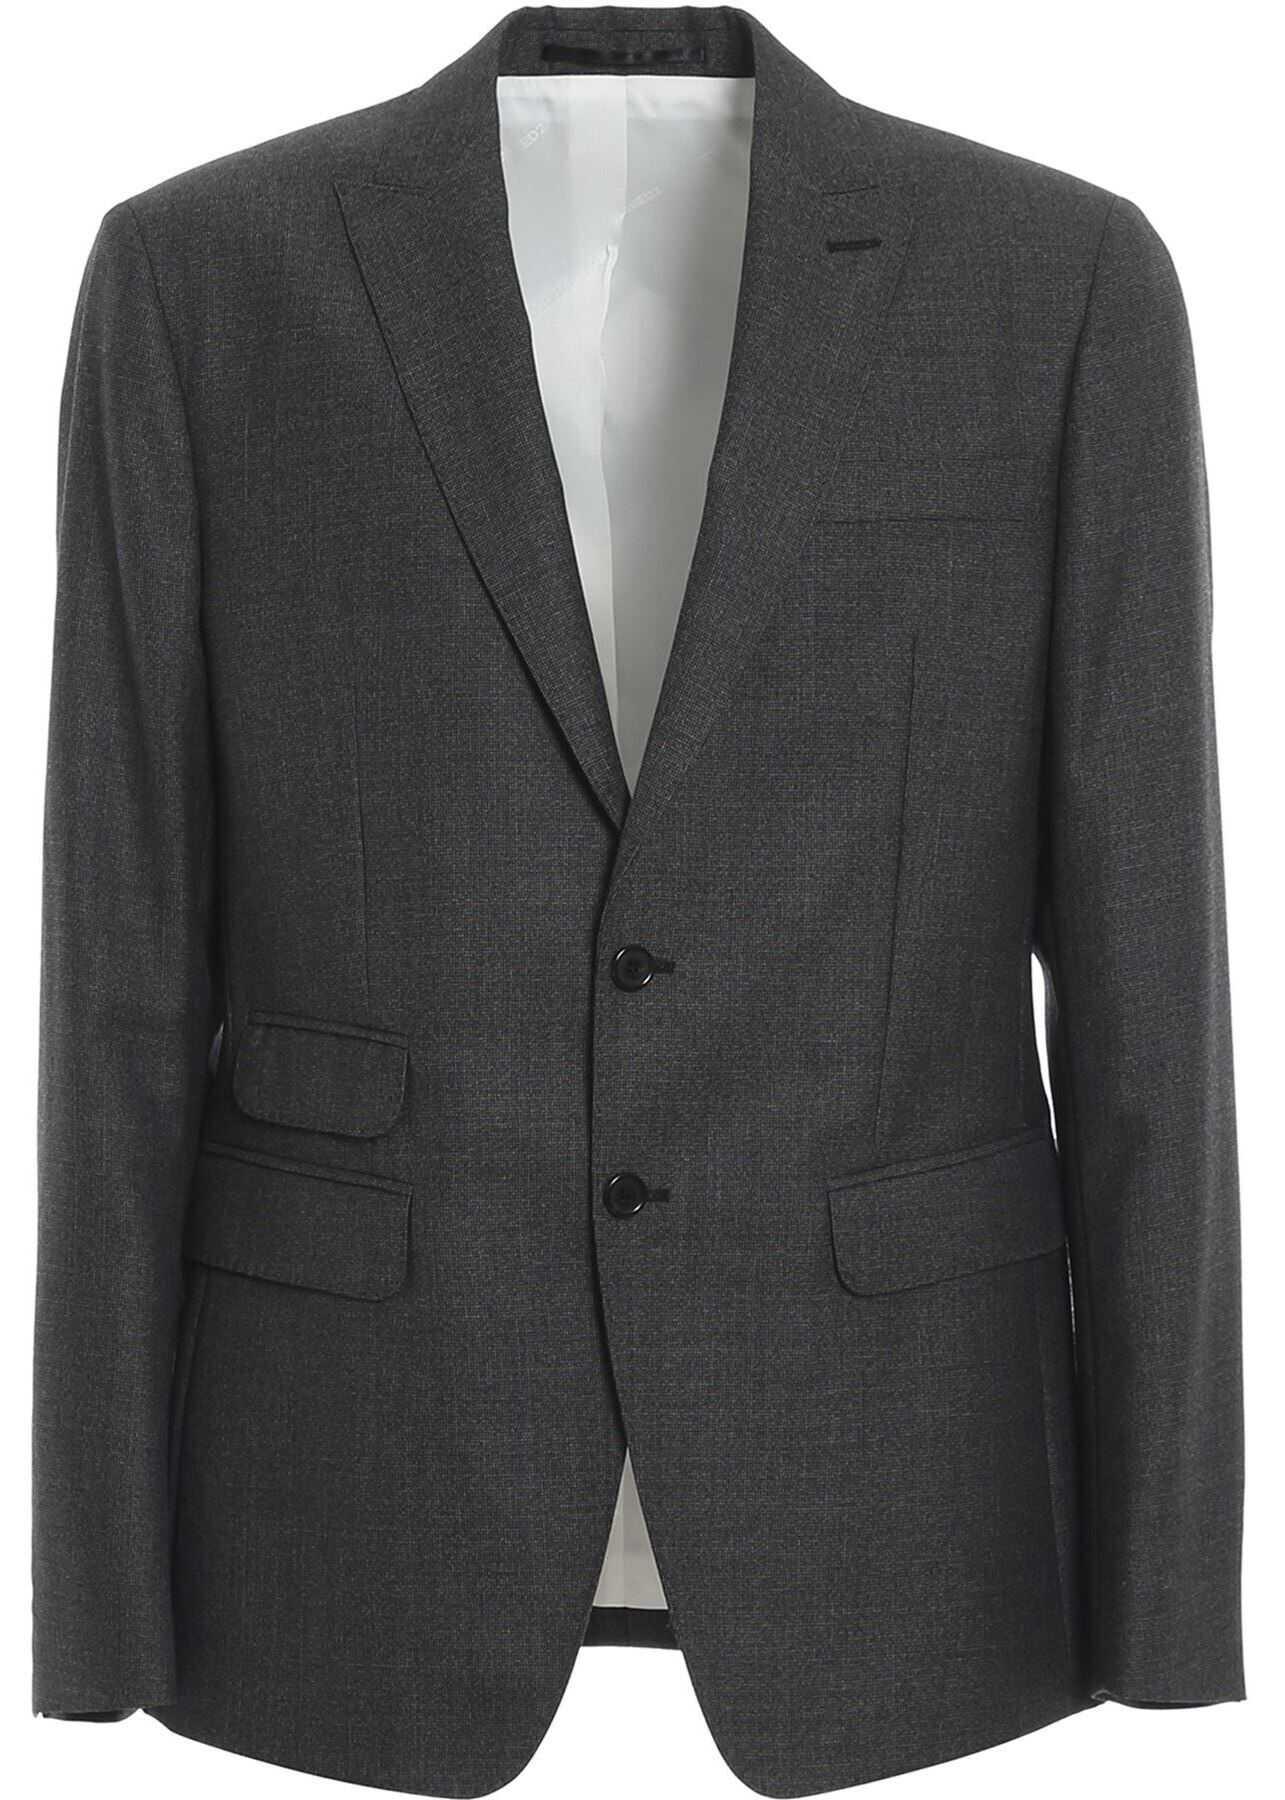 Two-Piece Virgin Wool Suit In Grey